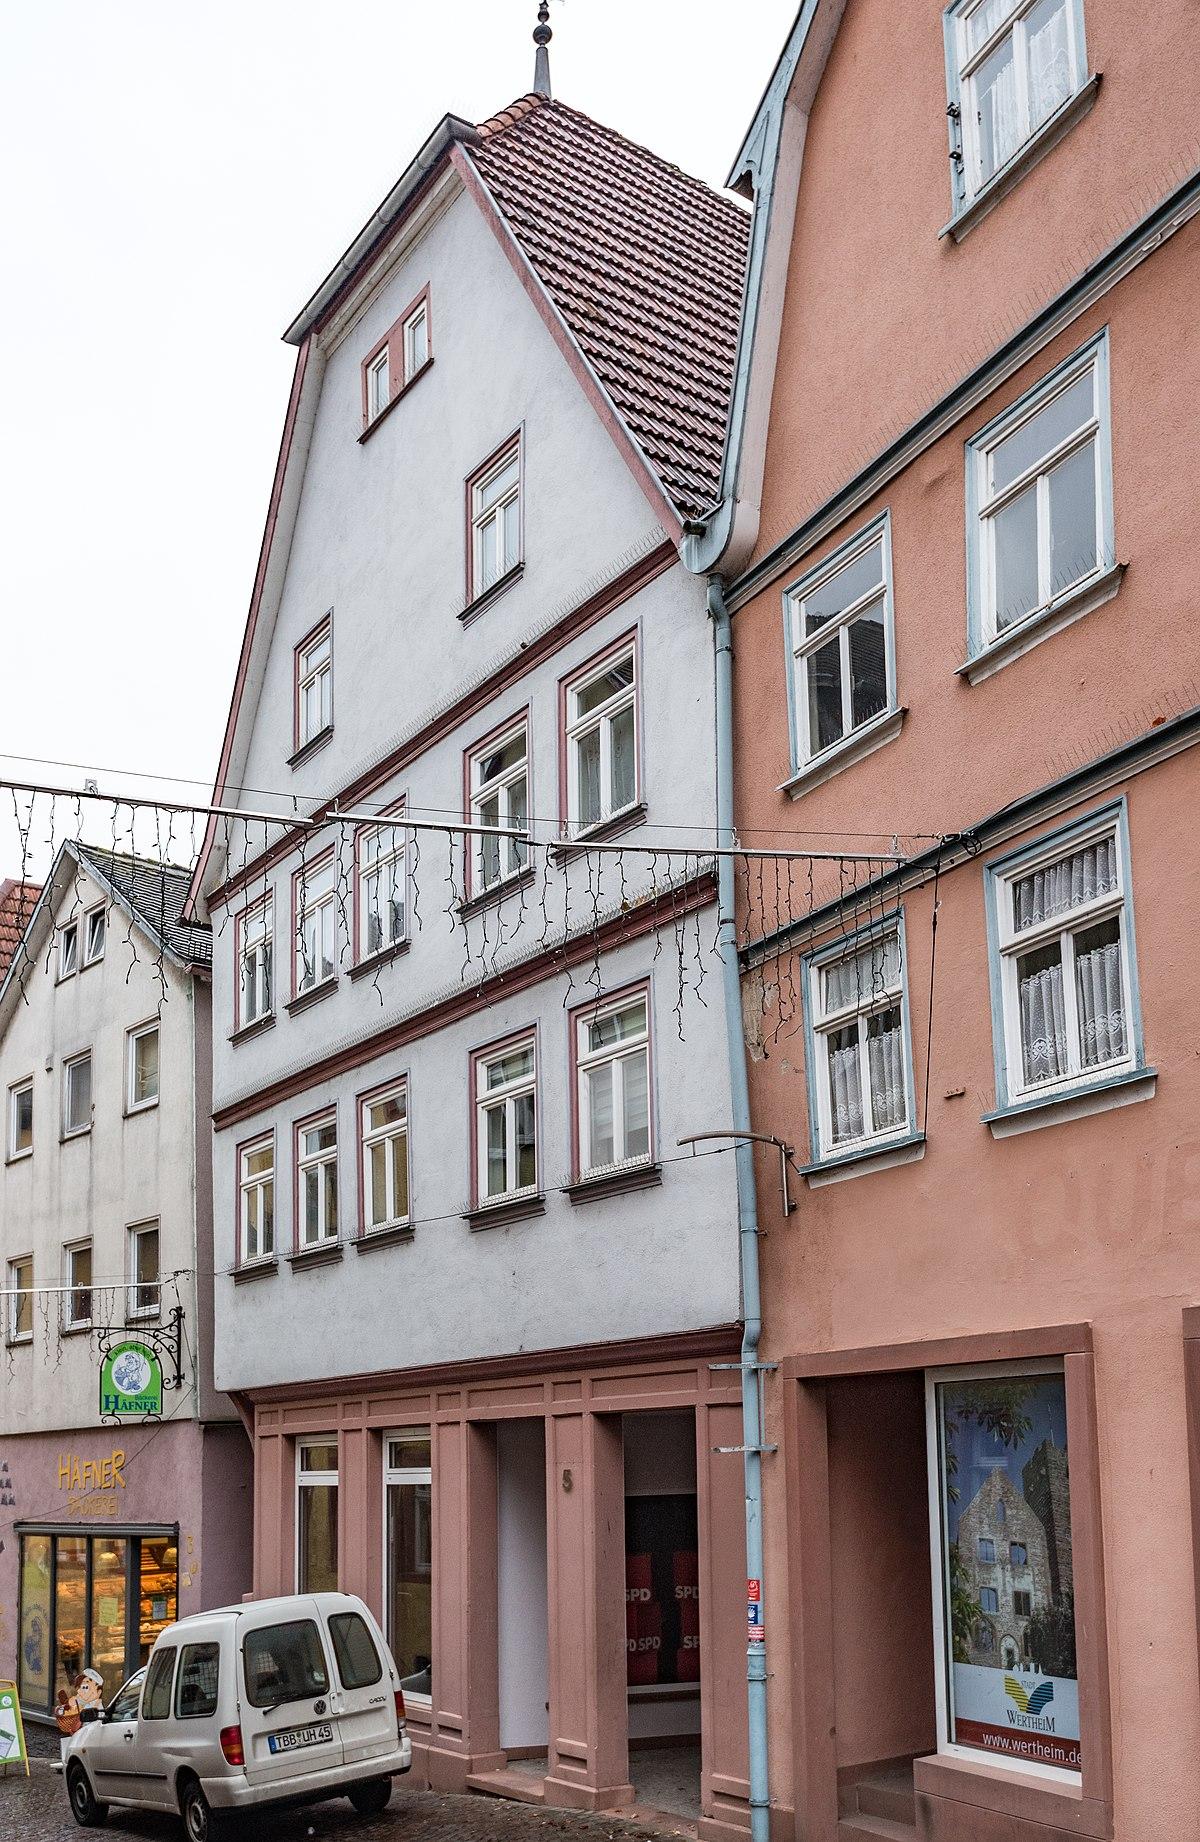 Hospitalstraße